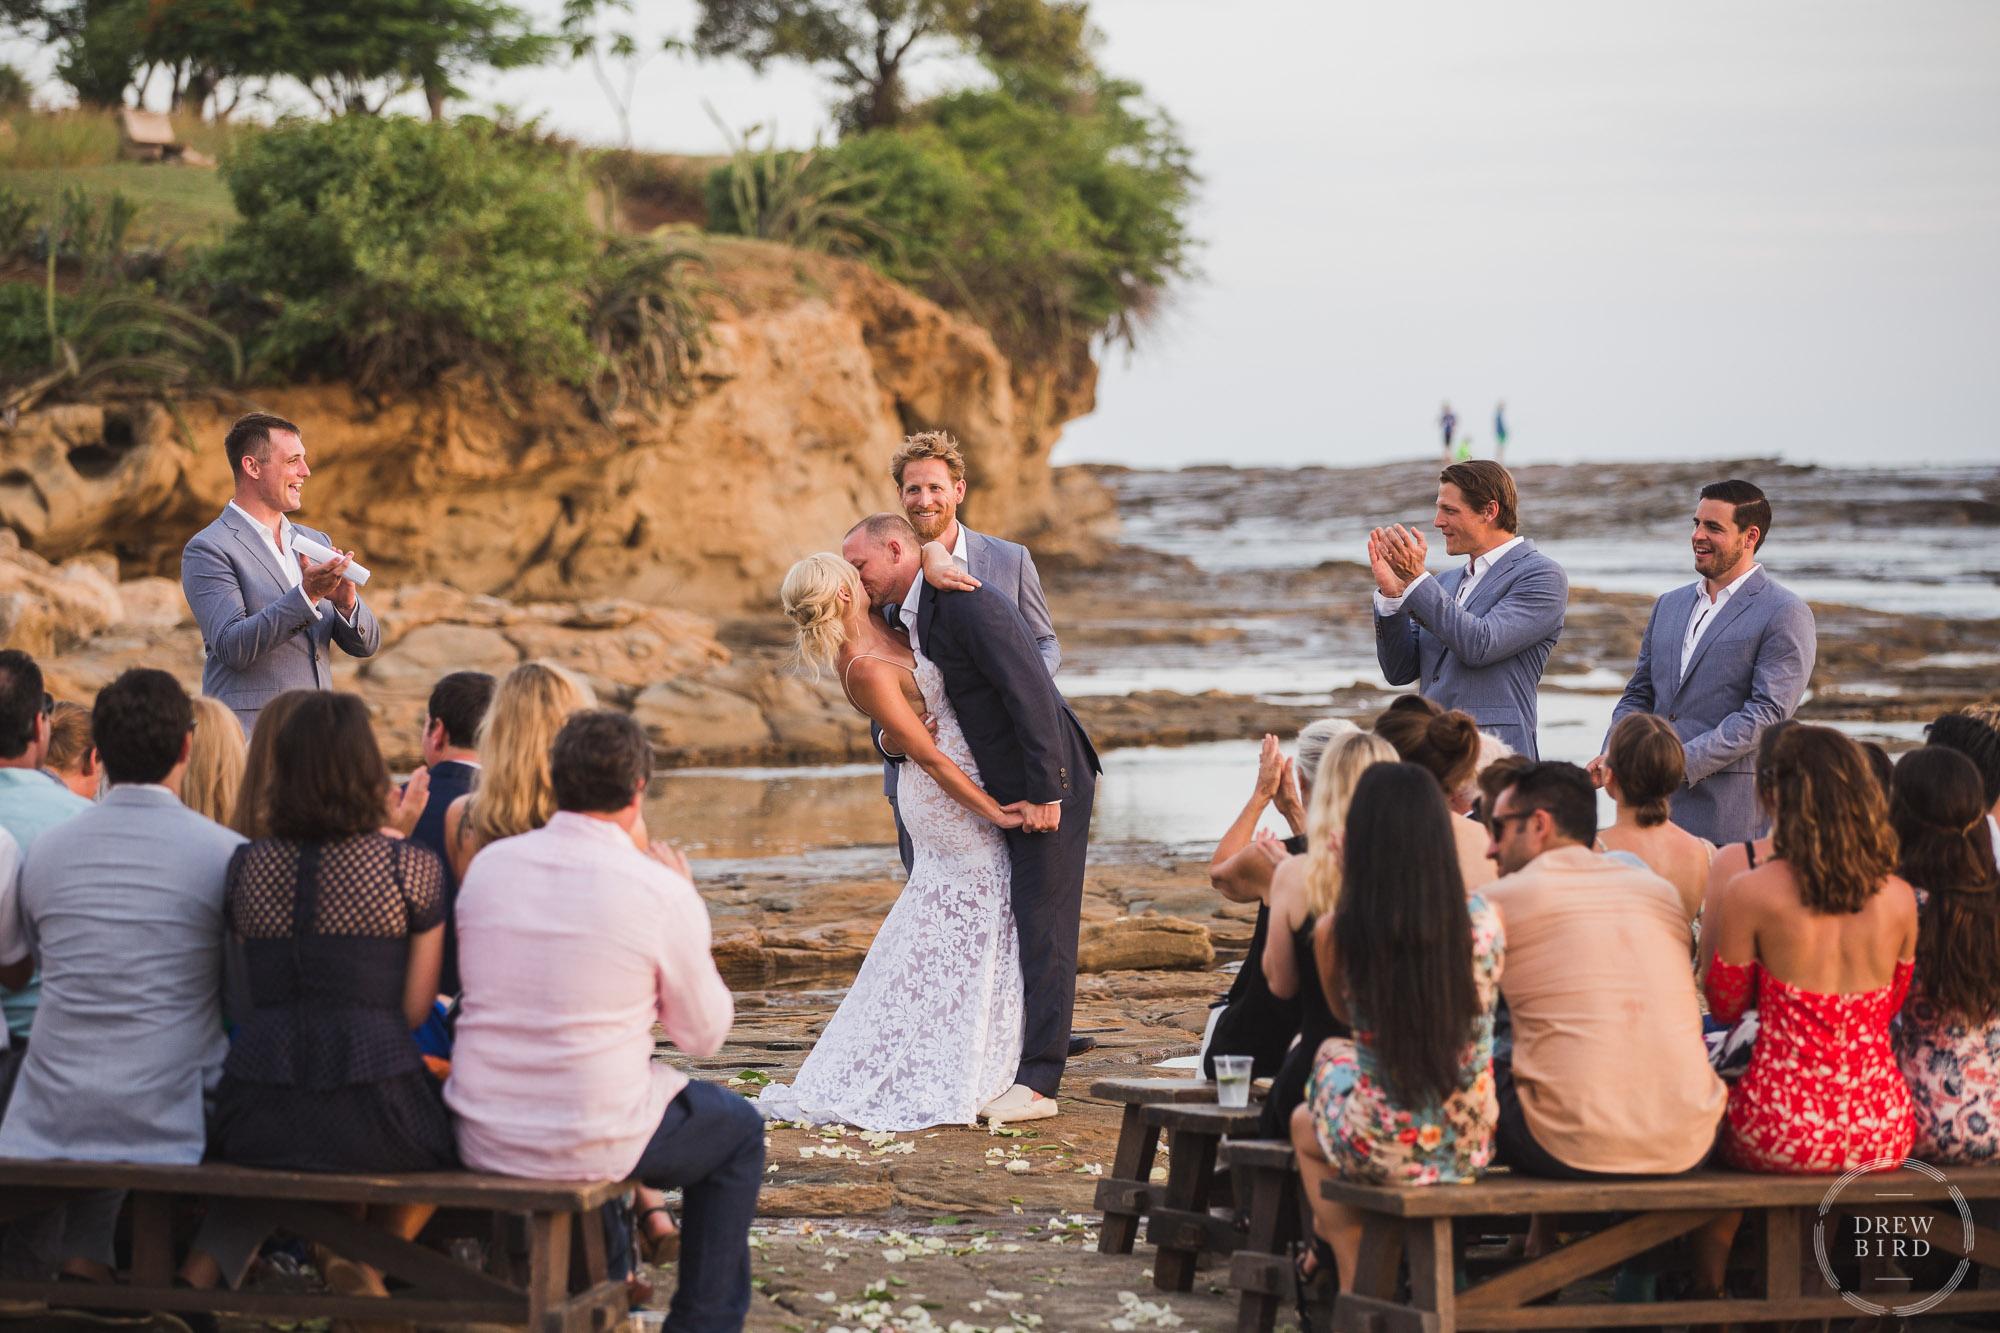 Bride and groom kissing during sunset beach wedding ceremony on tidal rocks Rancho Santana Nicaragua destination wedding photographer. San Francisco wedding photojournalism by Drew Bird Photo.